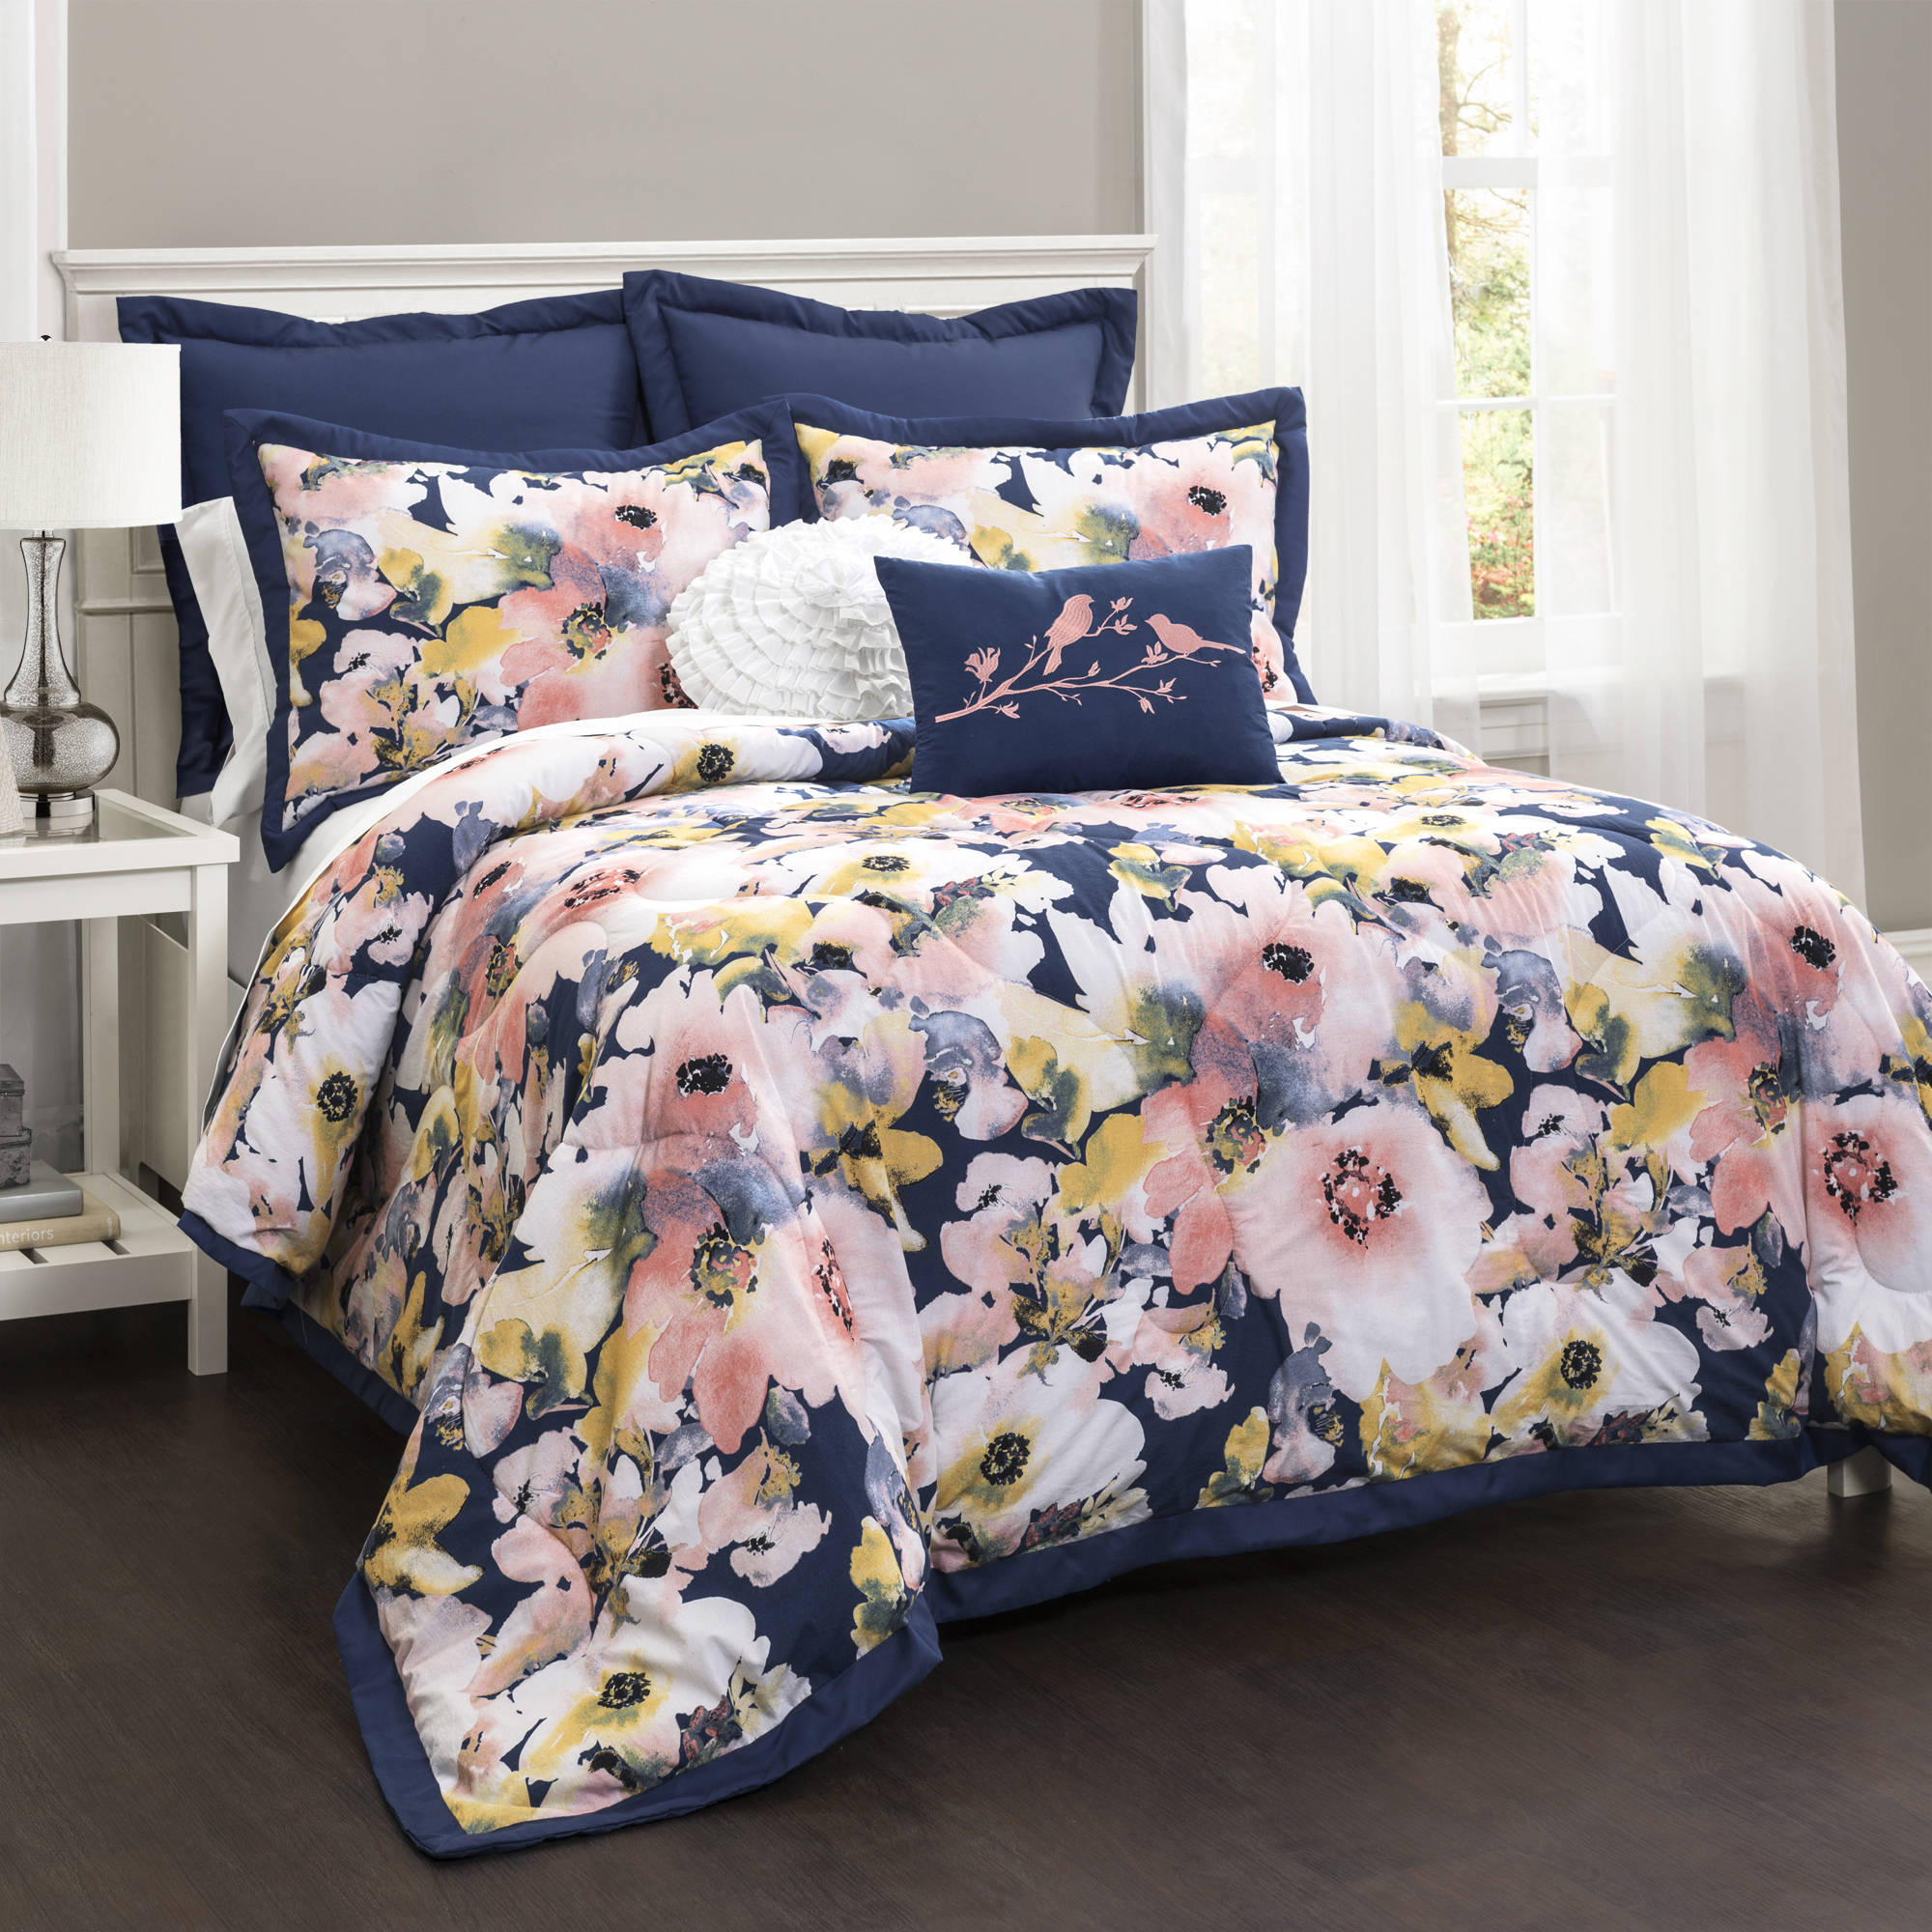 Floral Watercolor 7 Piece Bedding Comforter Set Walmart Com